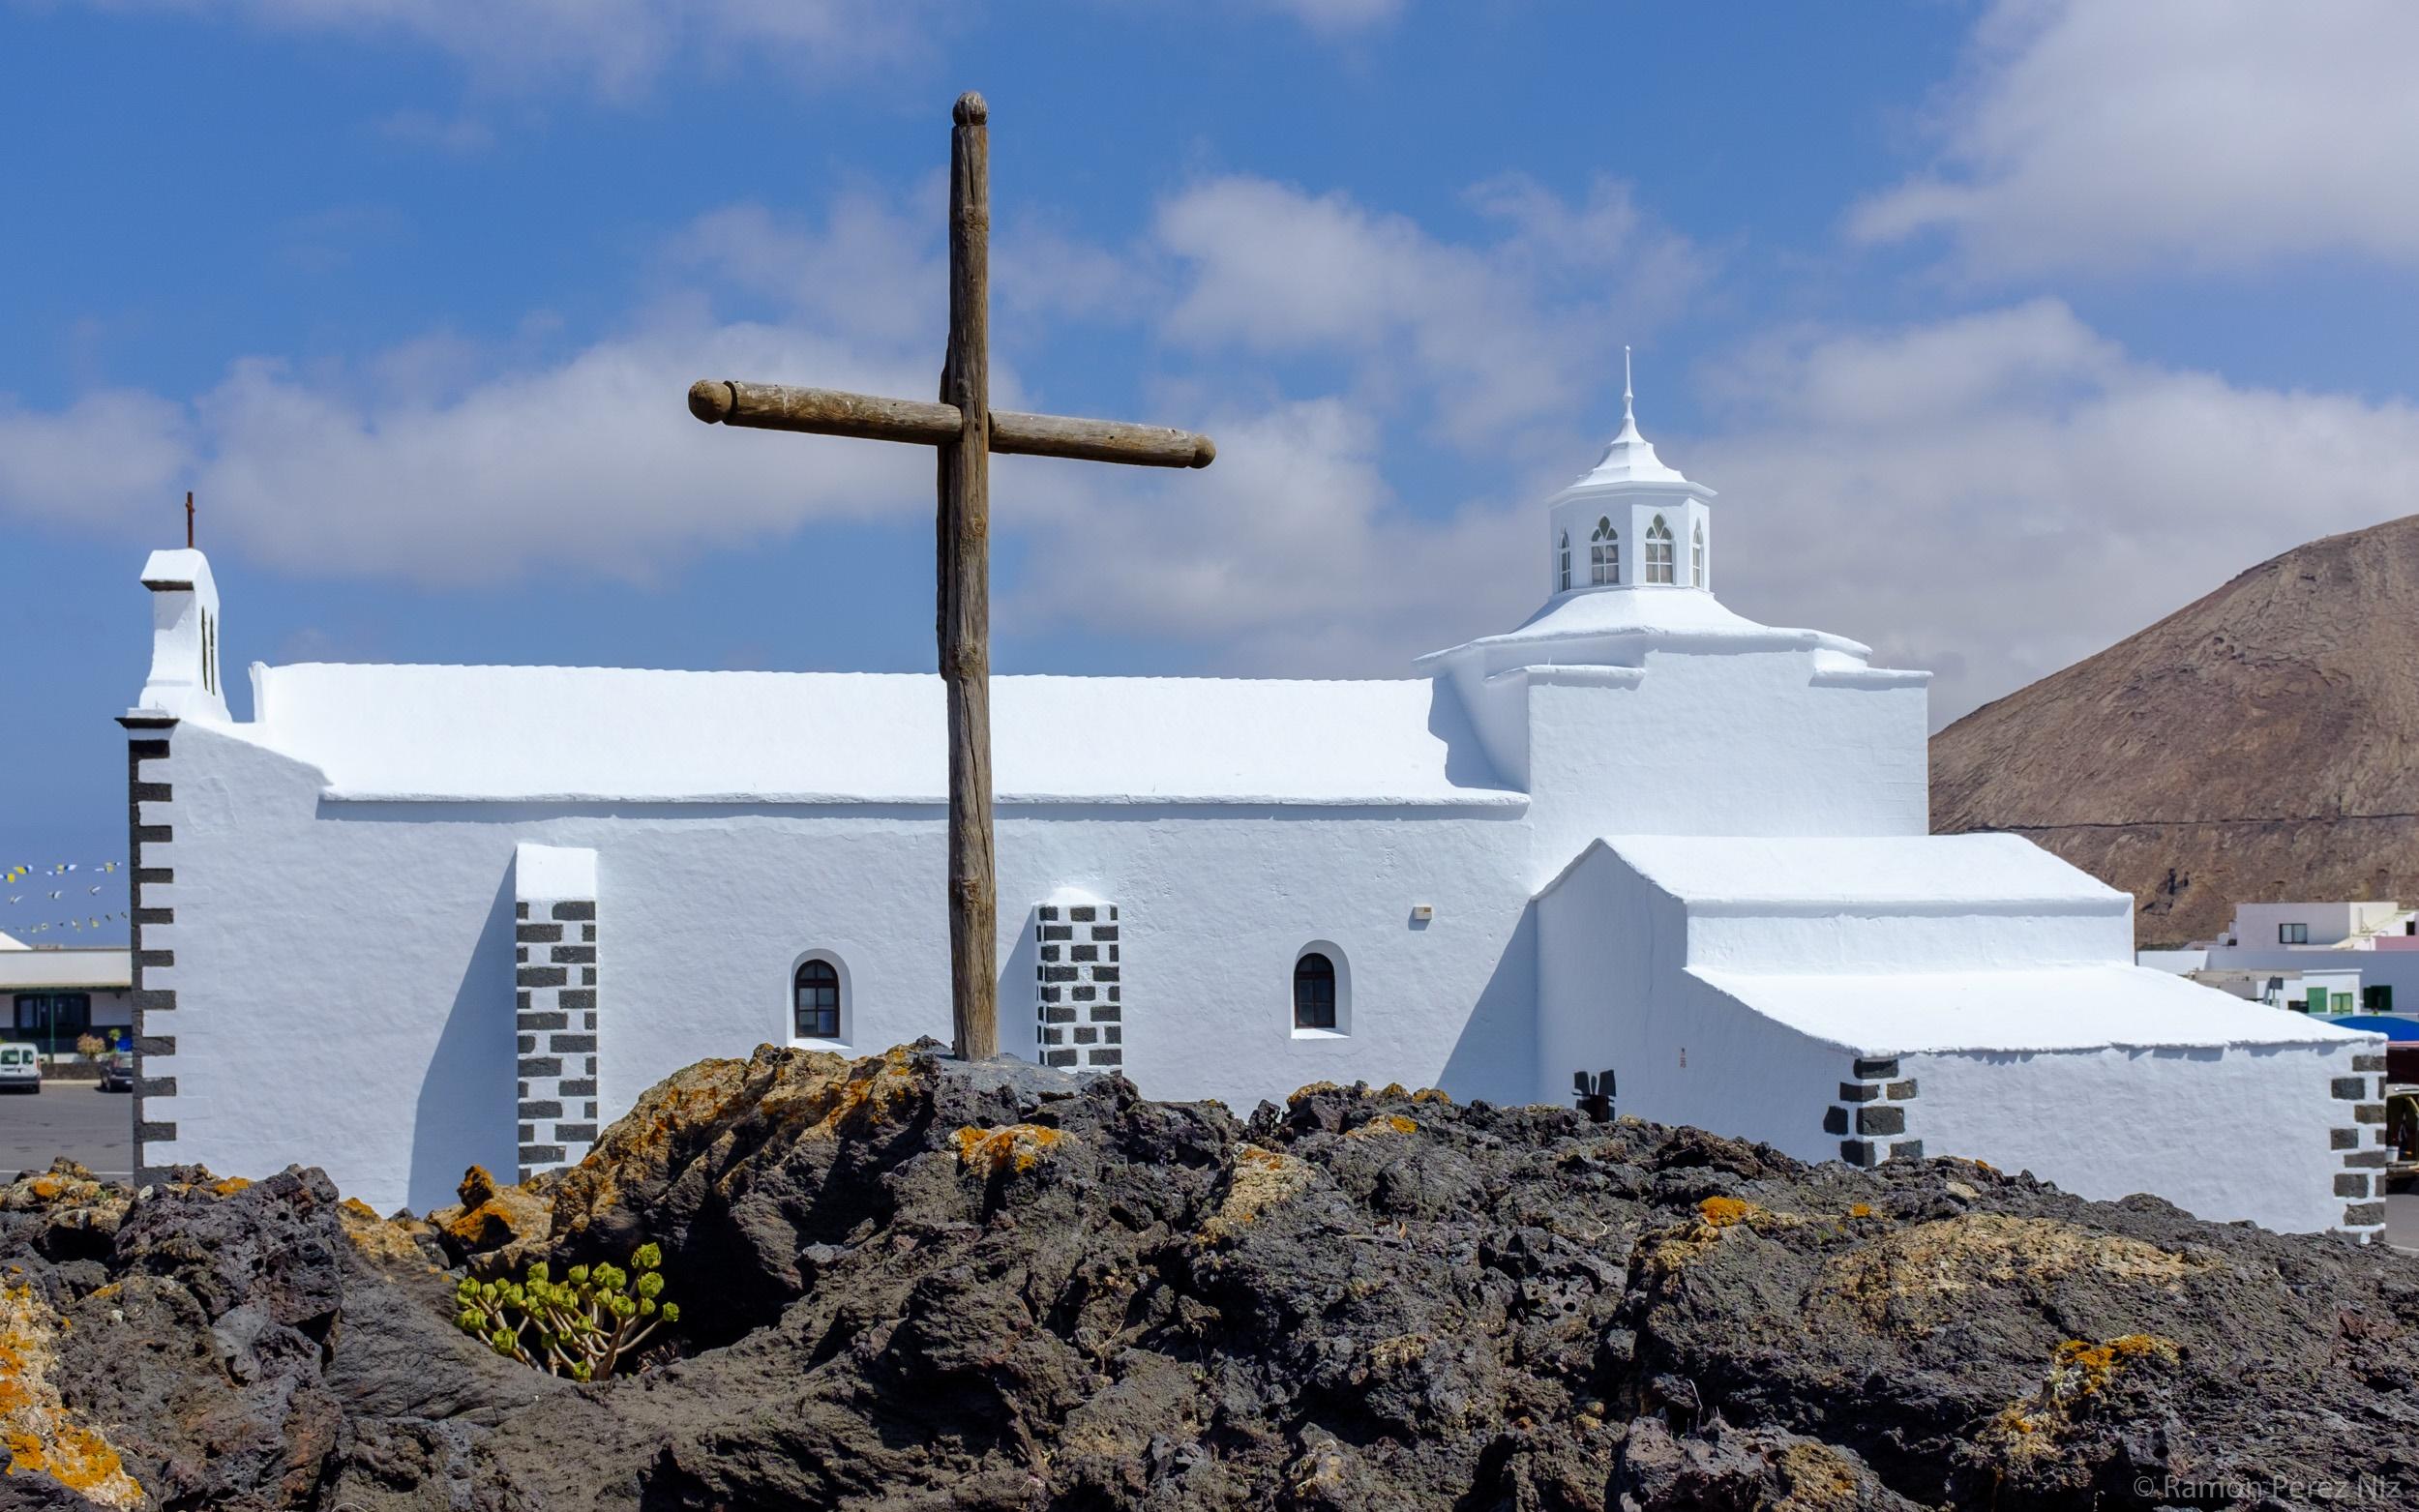 La cruz de la ermita de Los Dolores, por Ramón Pérez Niz